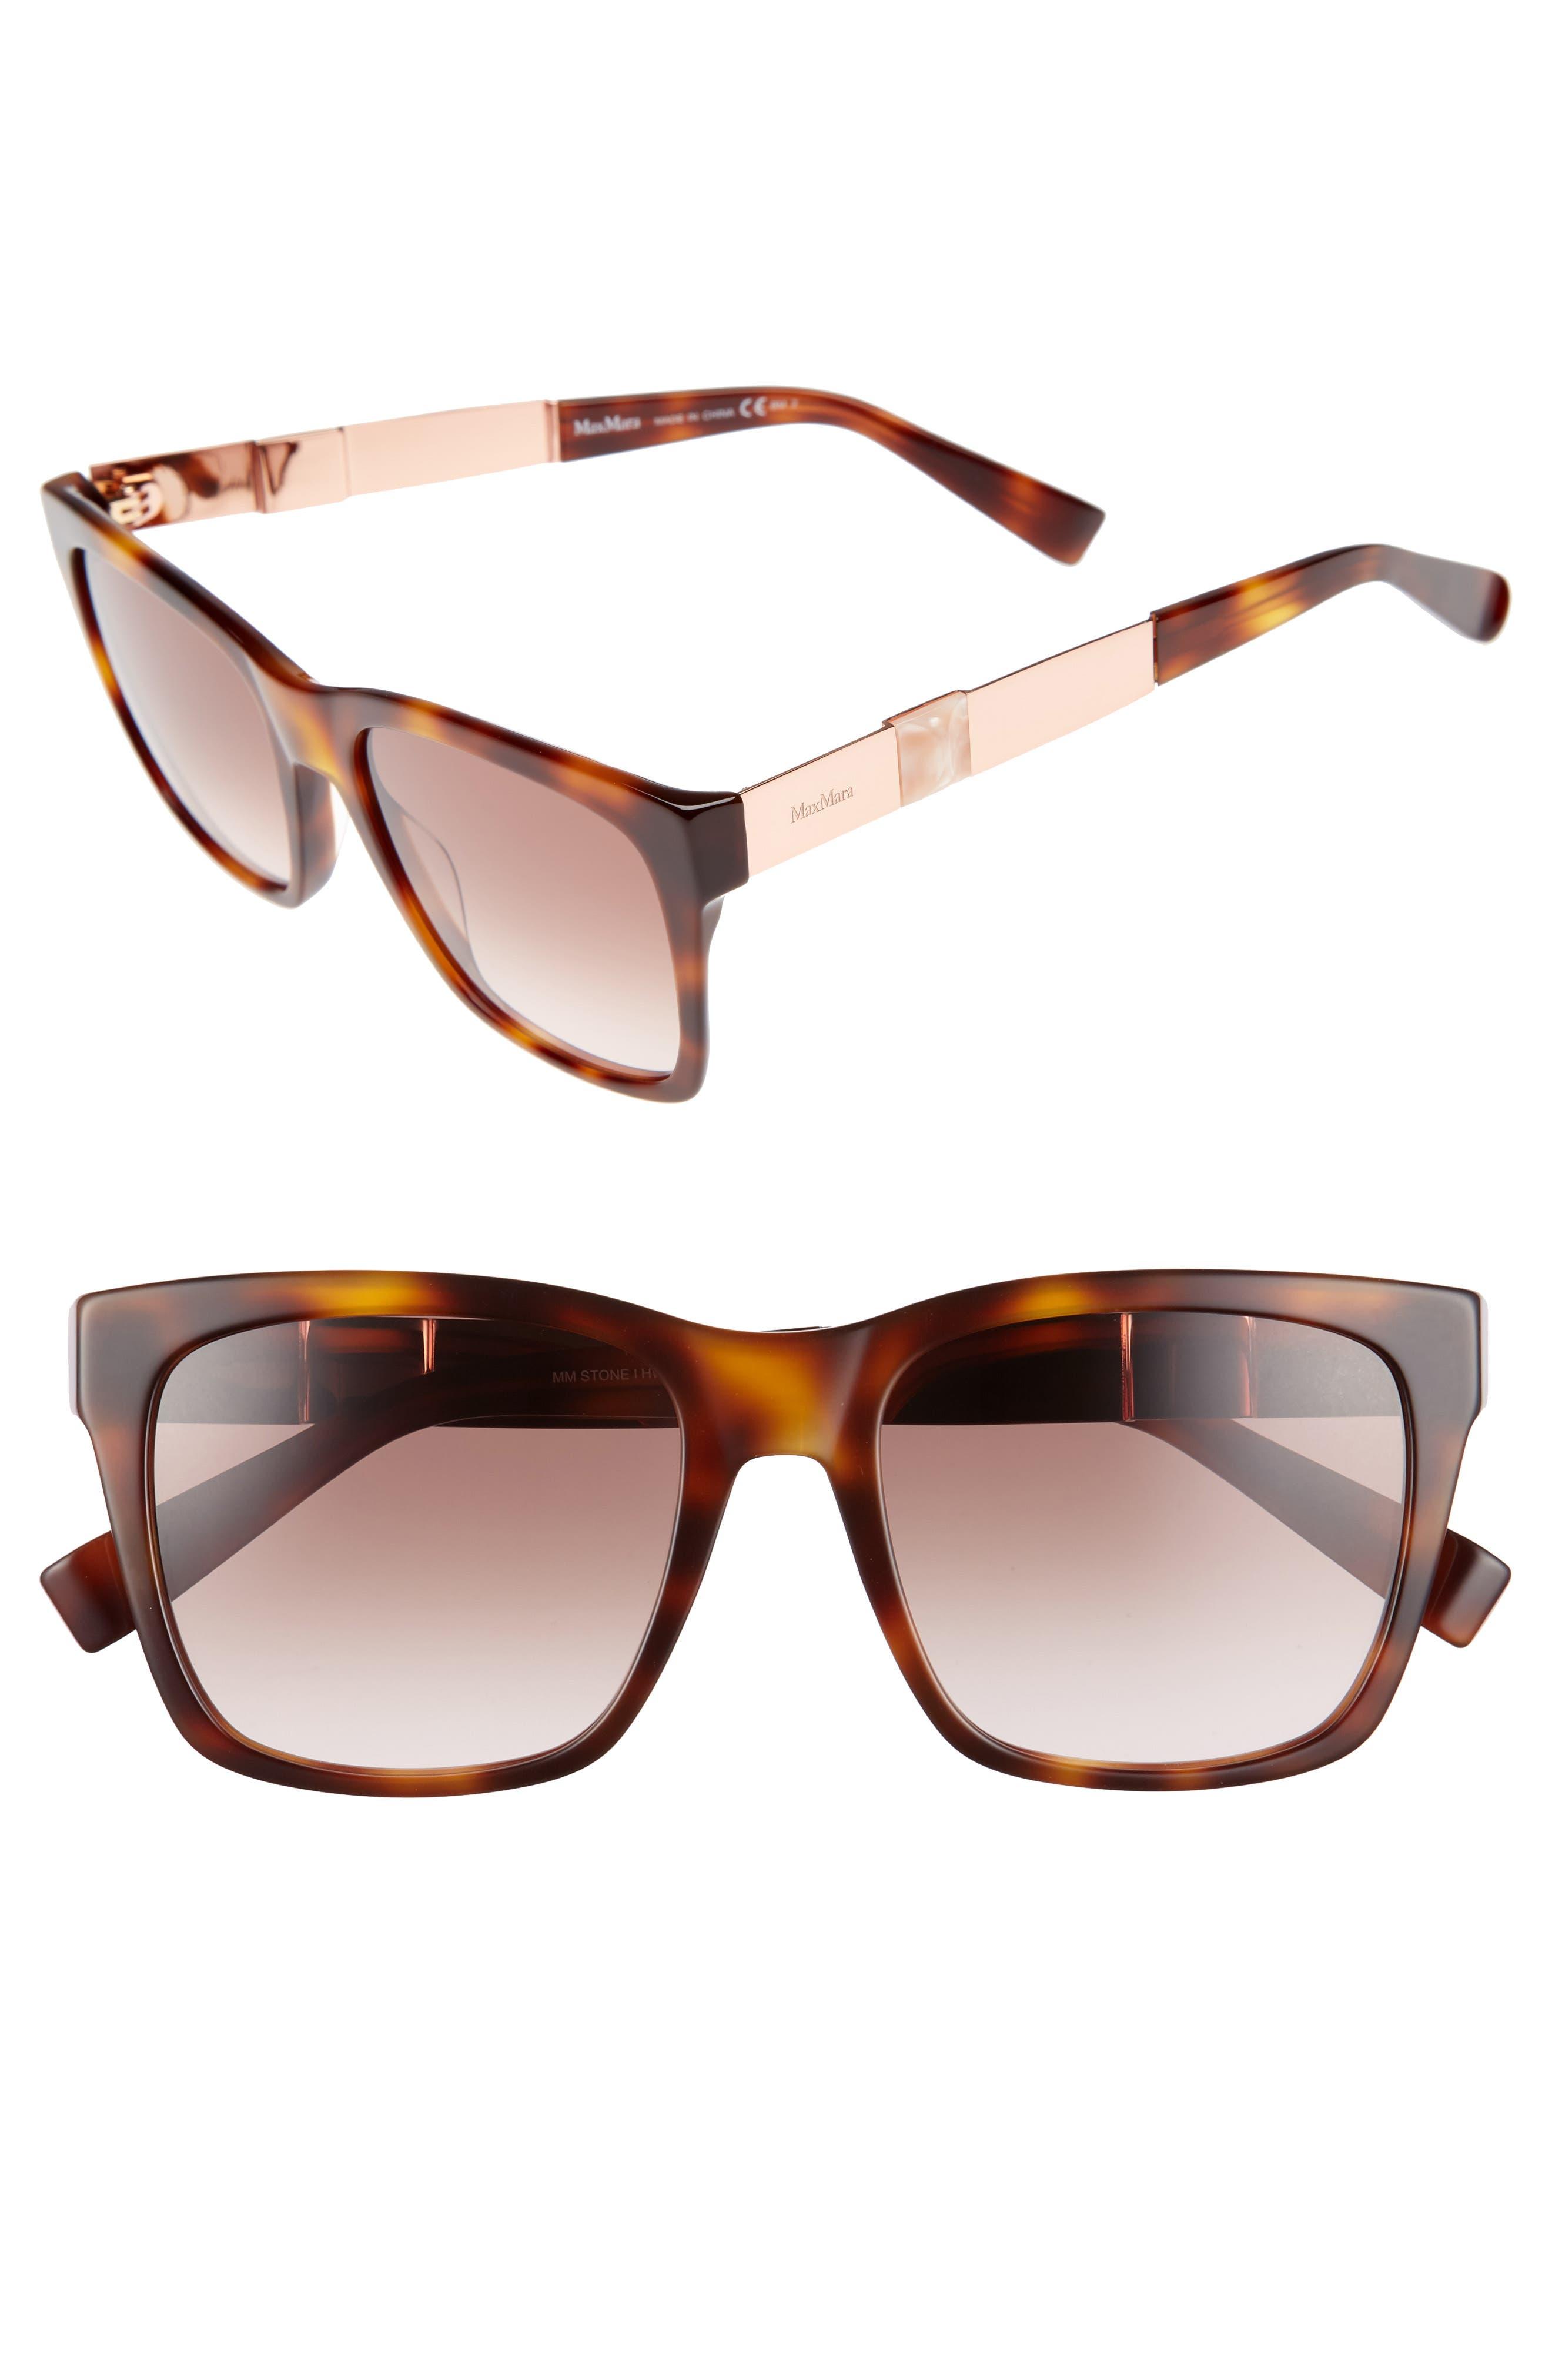 Stone 54mm Gradient Sunglasses,                         Main,                         color, Havana/ Red/ Gold